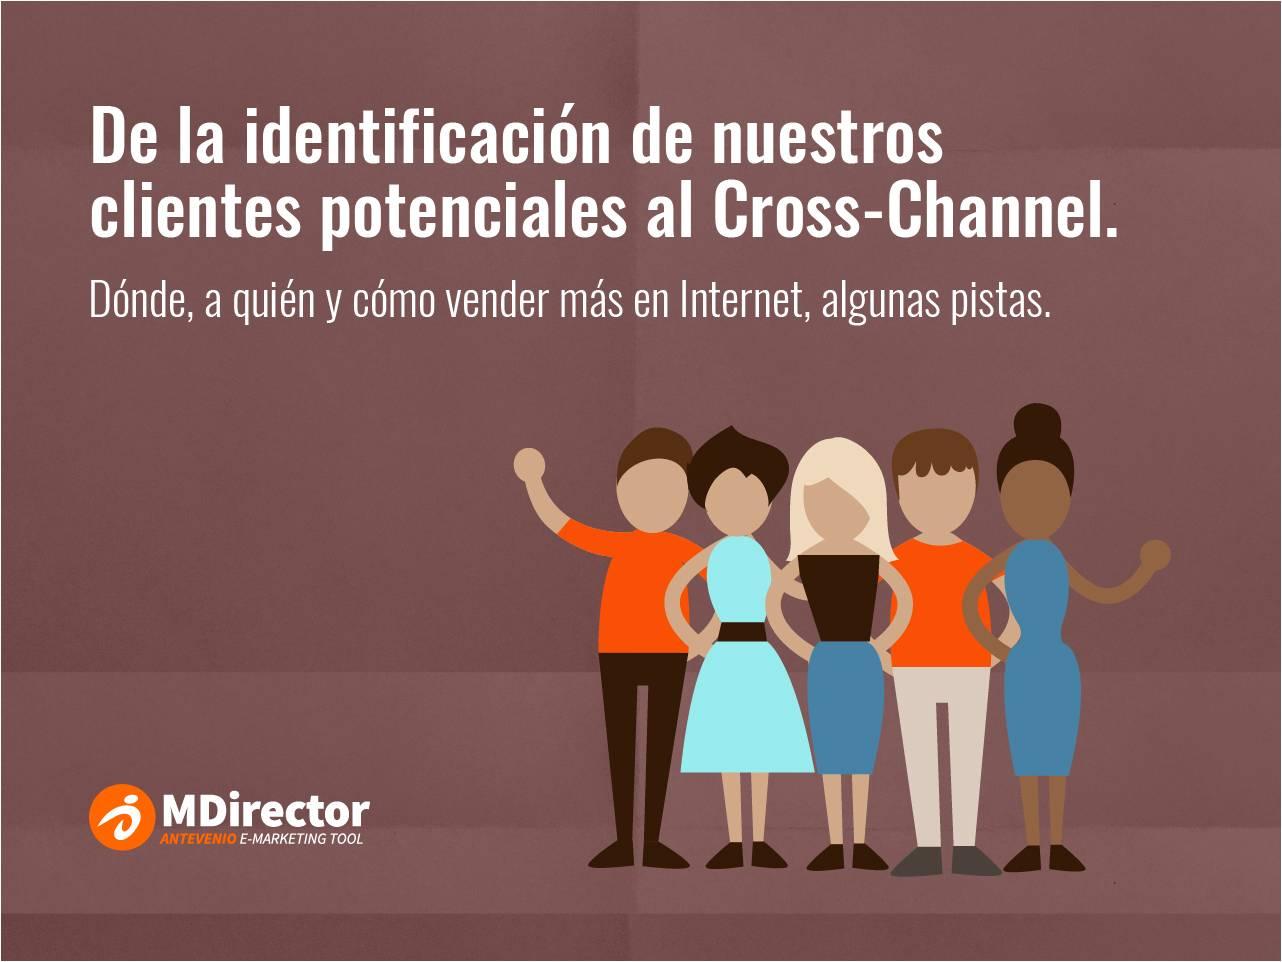 Cross-Channel Marketing by MDirector